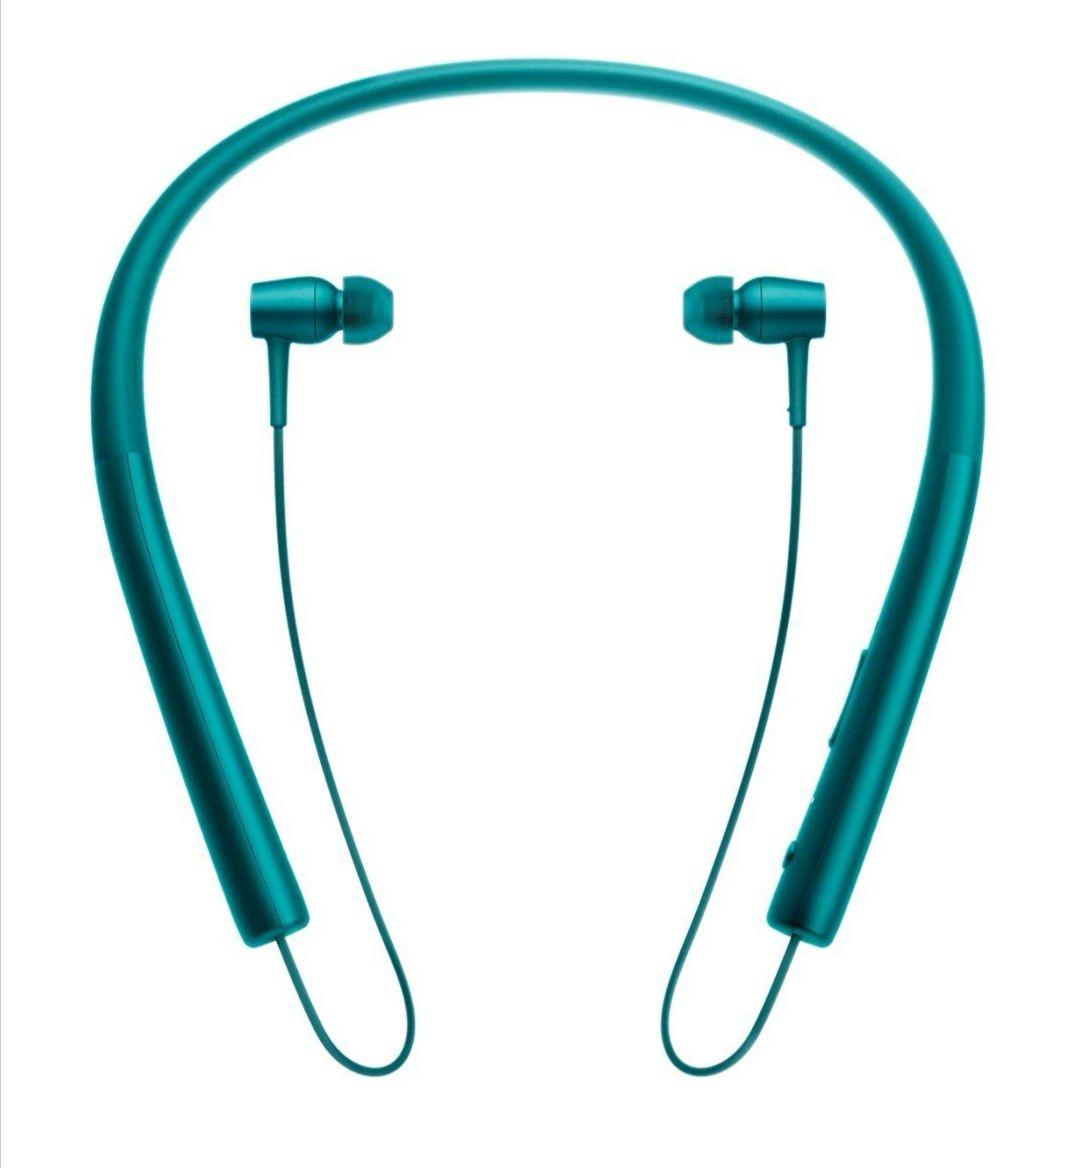 Sony h.ear EX750BT Bluetooth High Resolution In Ear Headphones - Blue £41.99 @ Jerco Micro FB Amazon